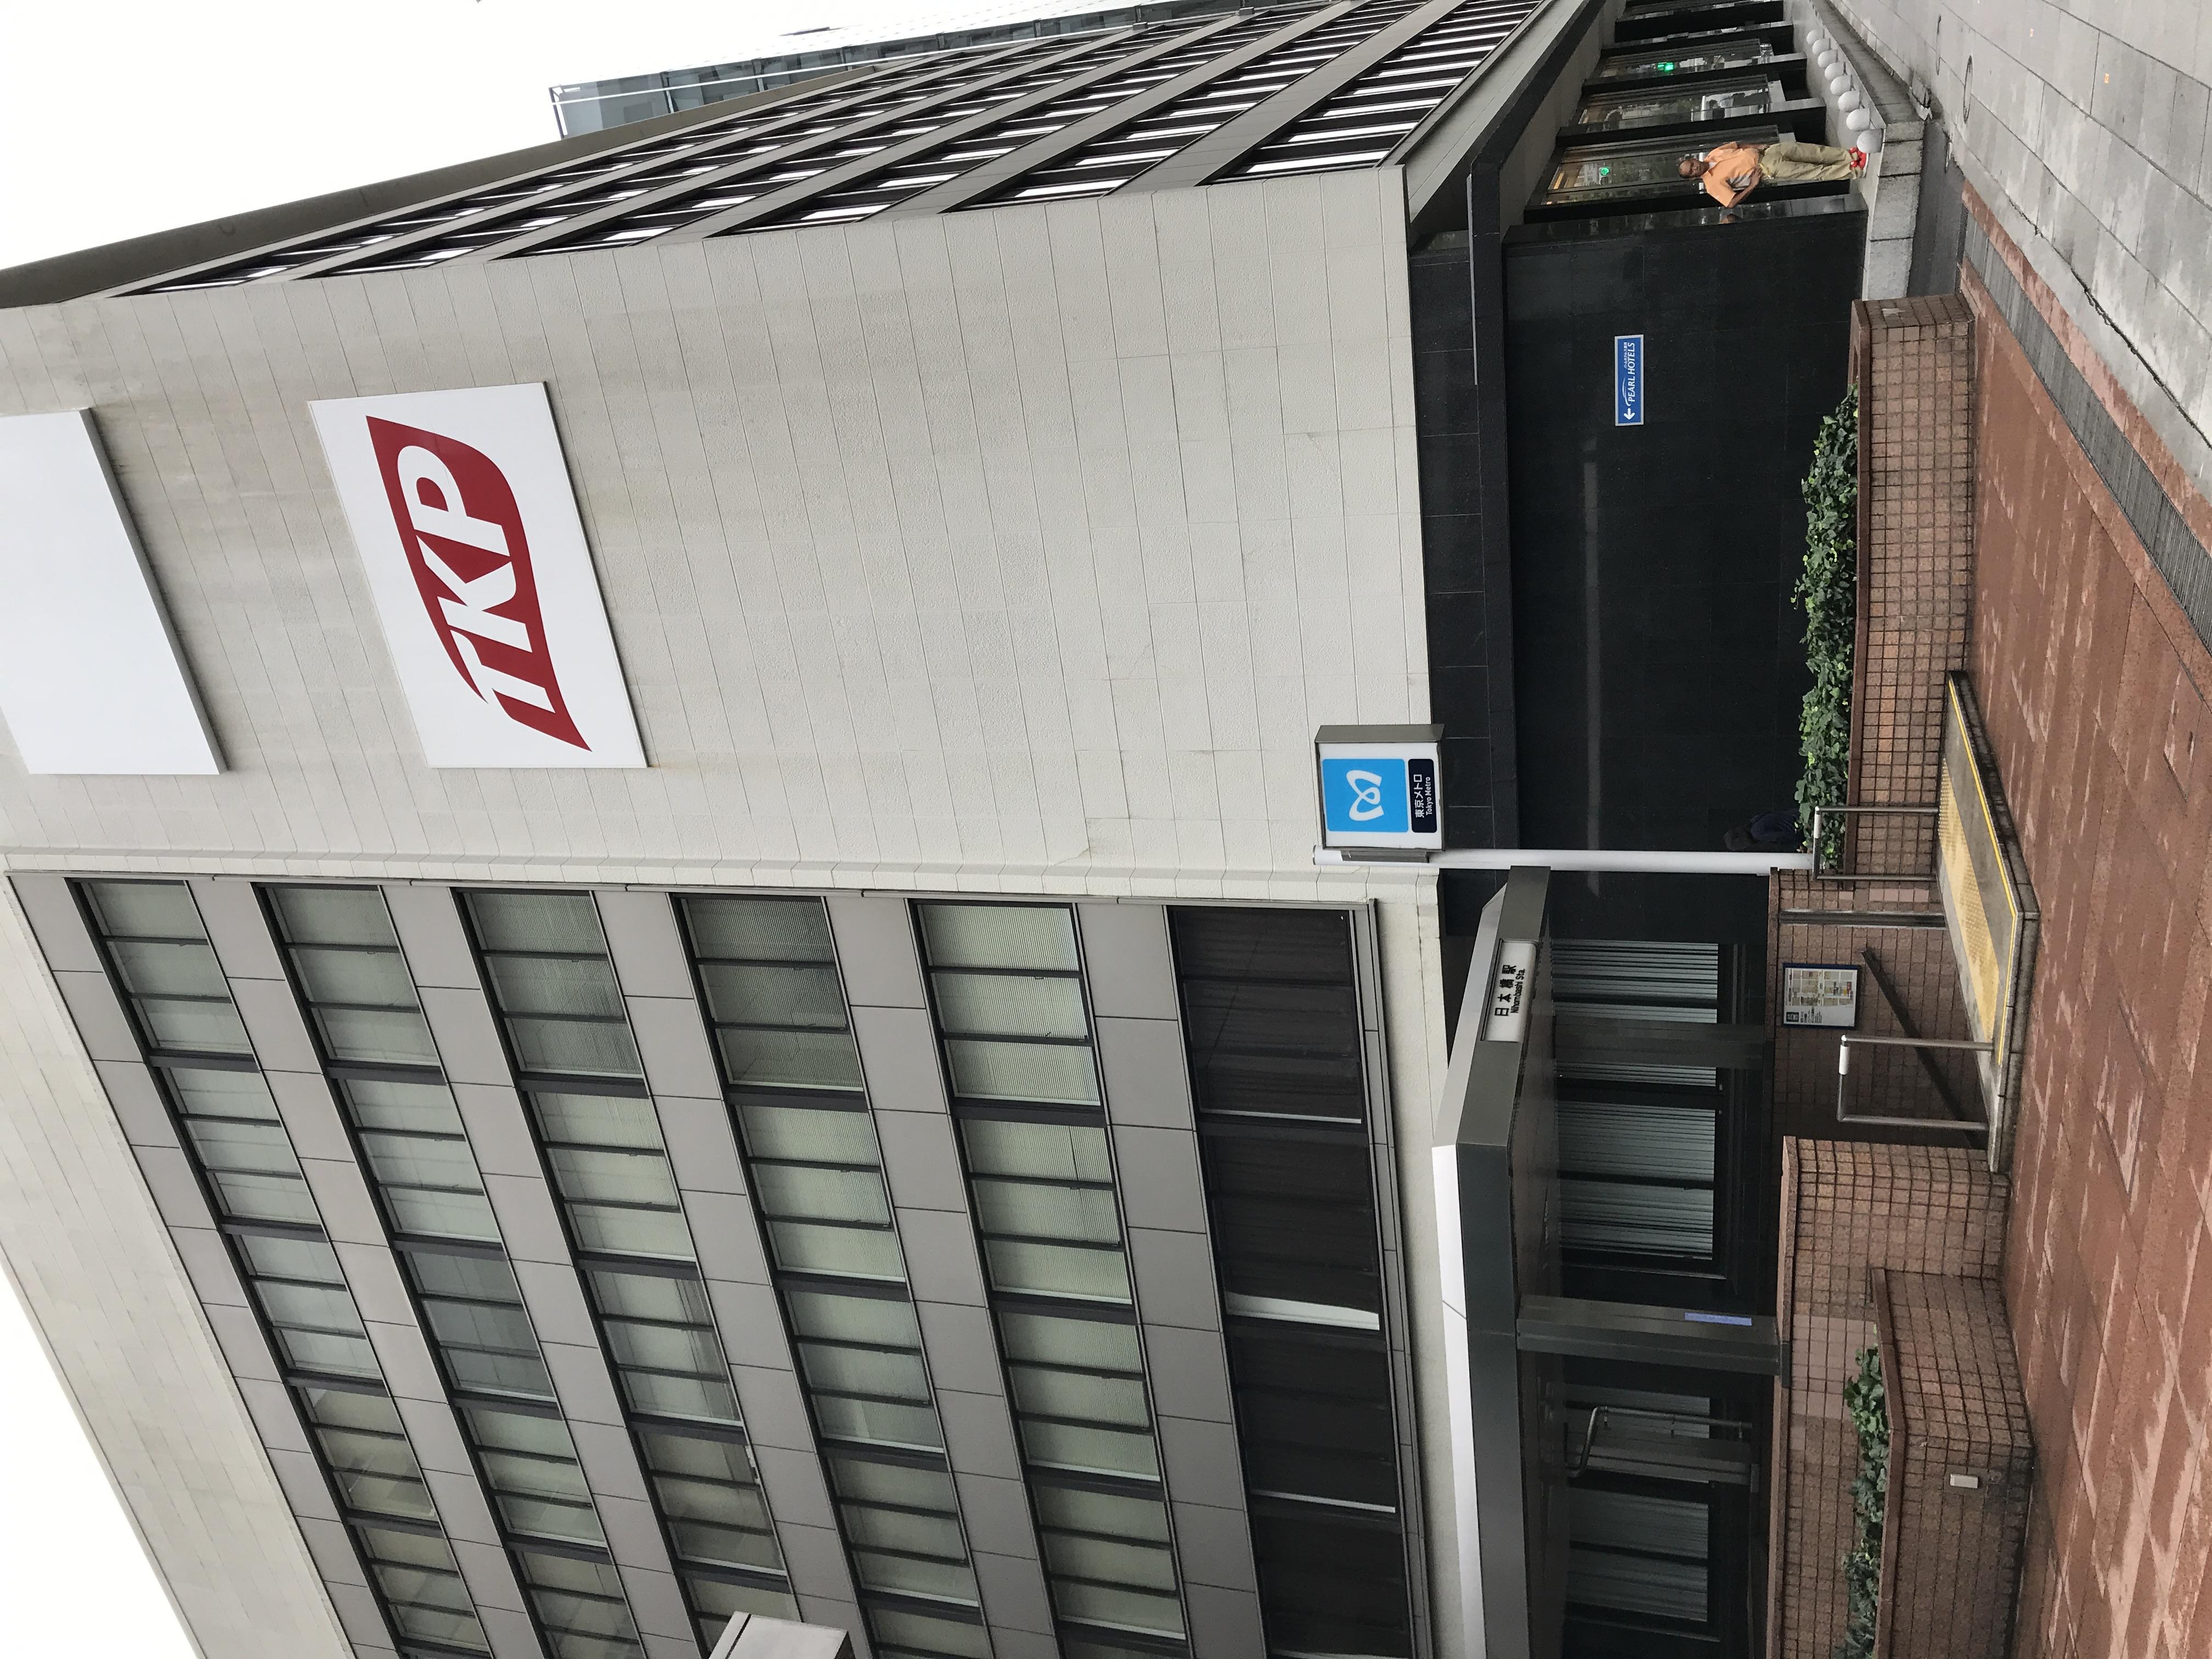 東京メトロ日本橋駅A1出口上